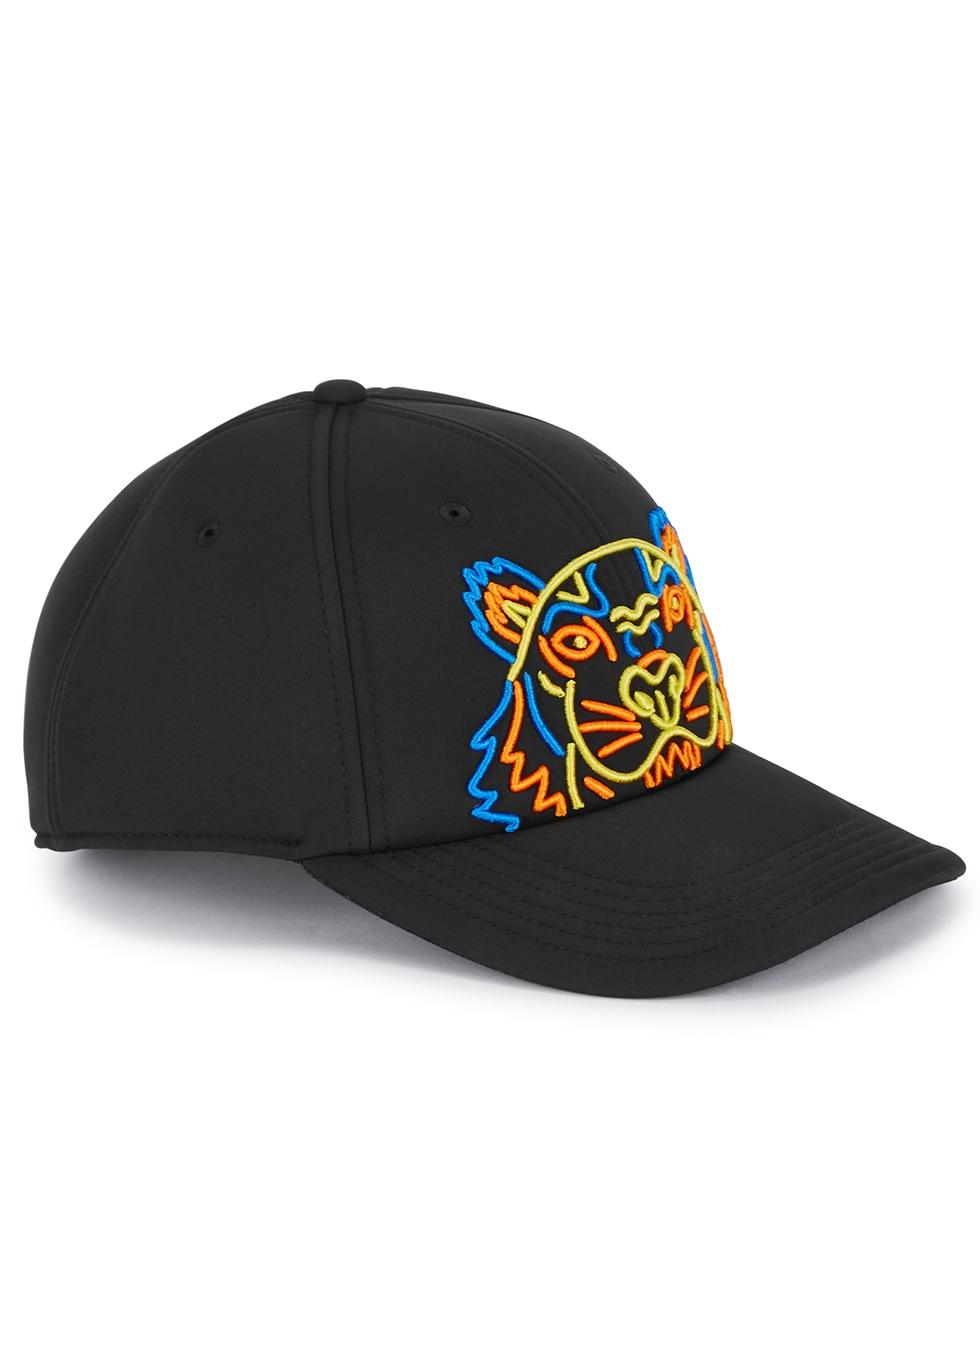 3dc144ff42b2 Men s Designer Hats - Harvey Nichols